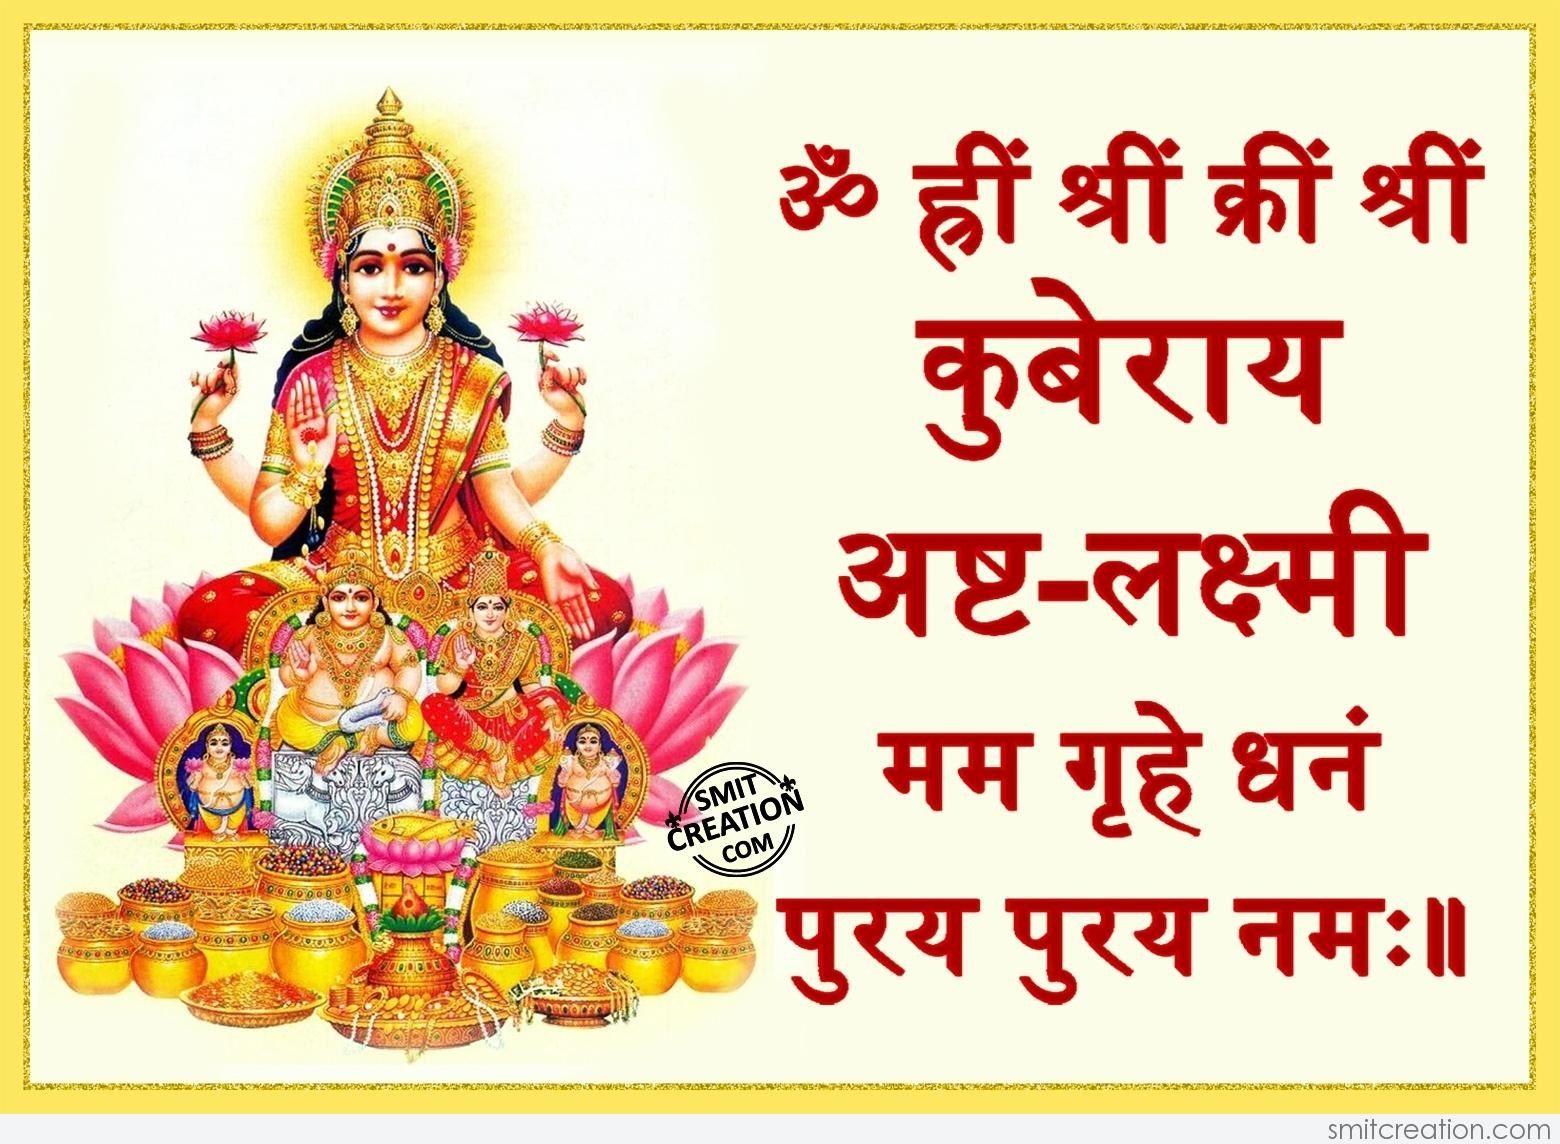 Mahalaxmi maa | Quotes | Vedic mantras, Hindu mantras